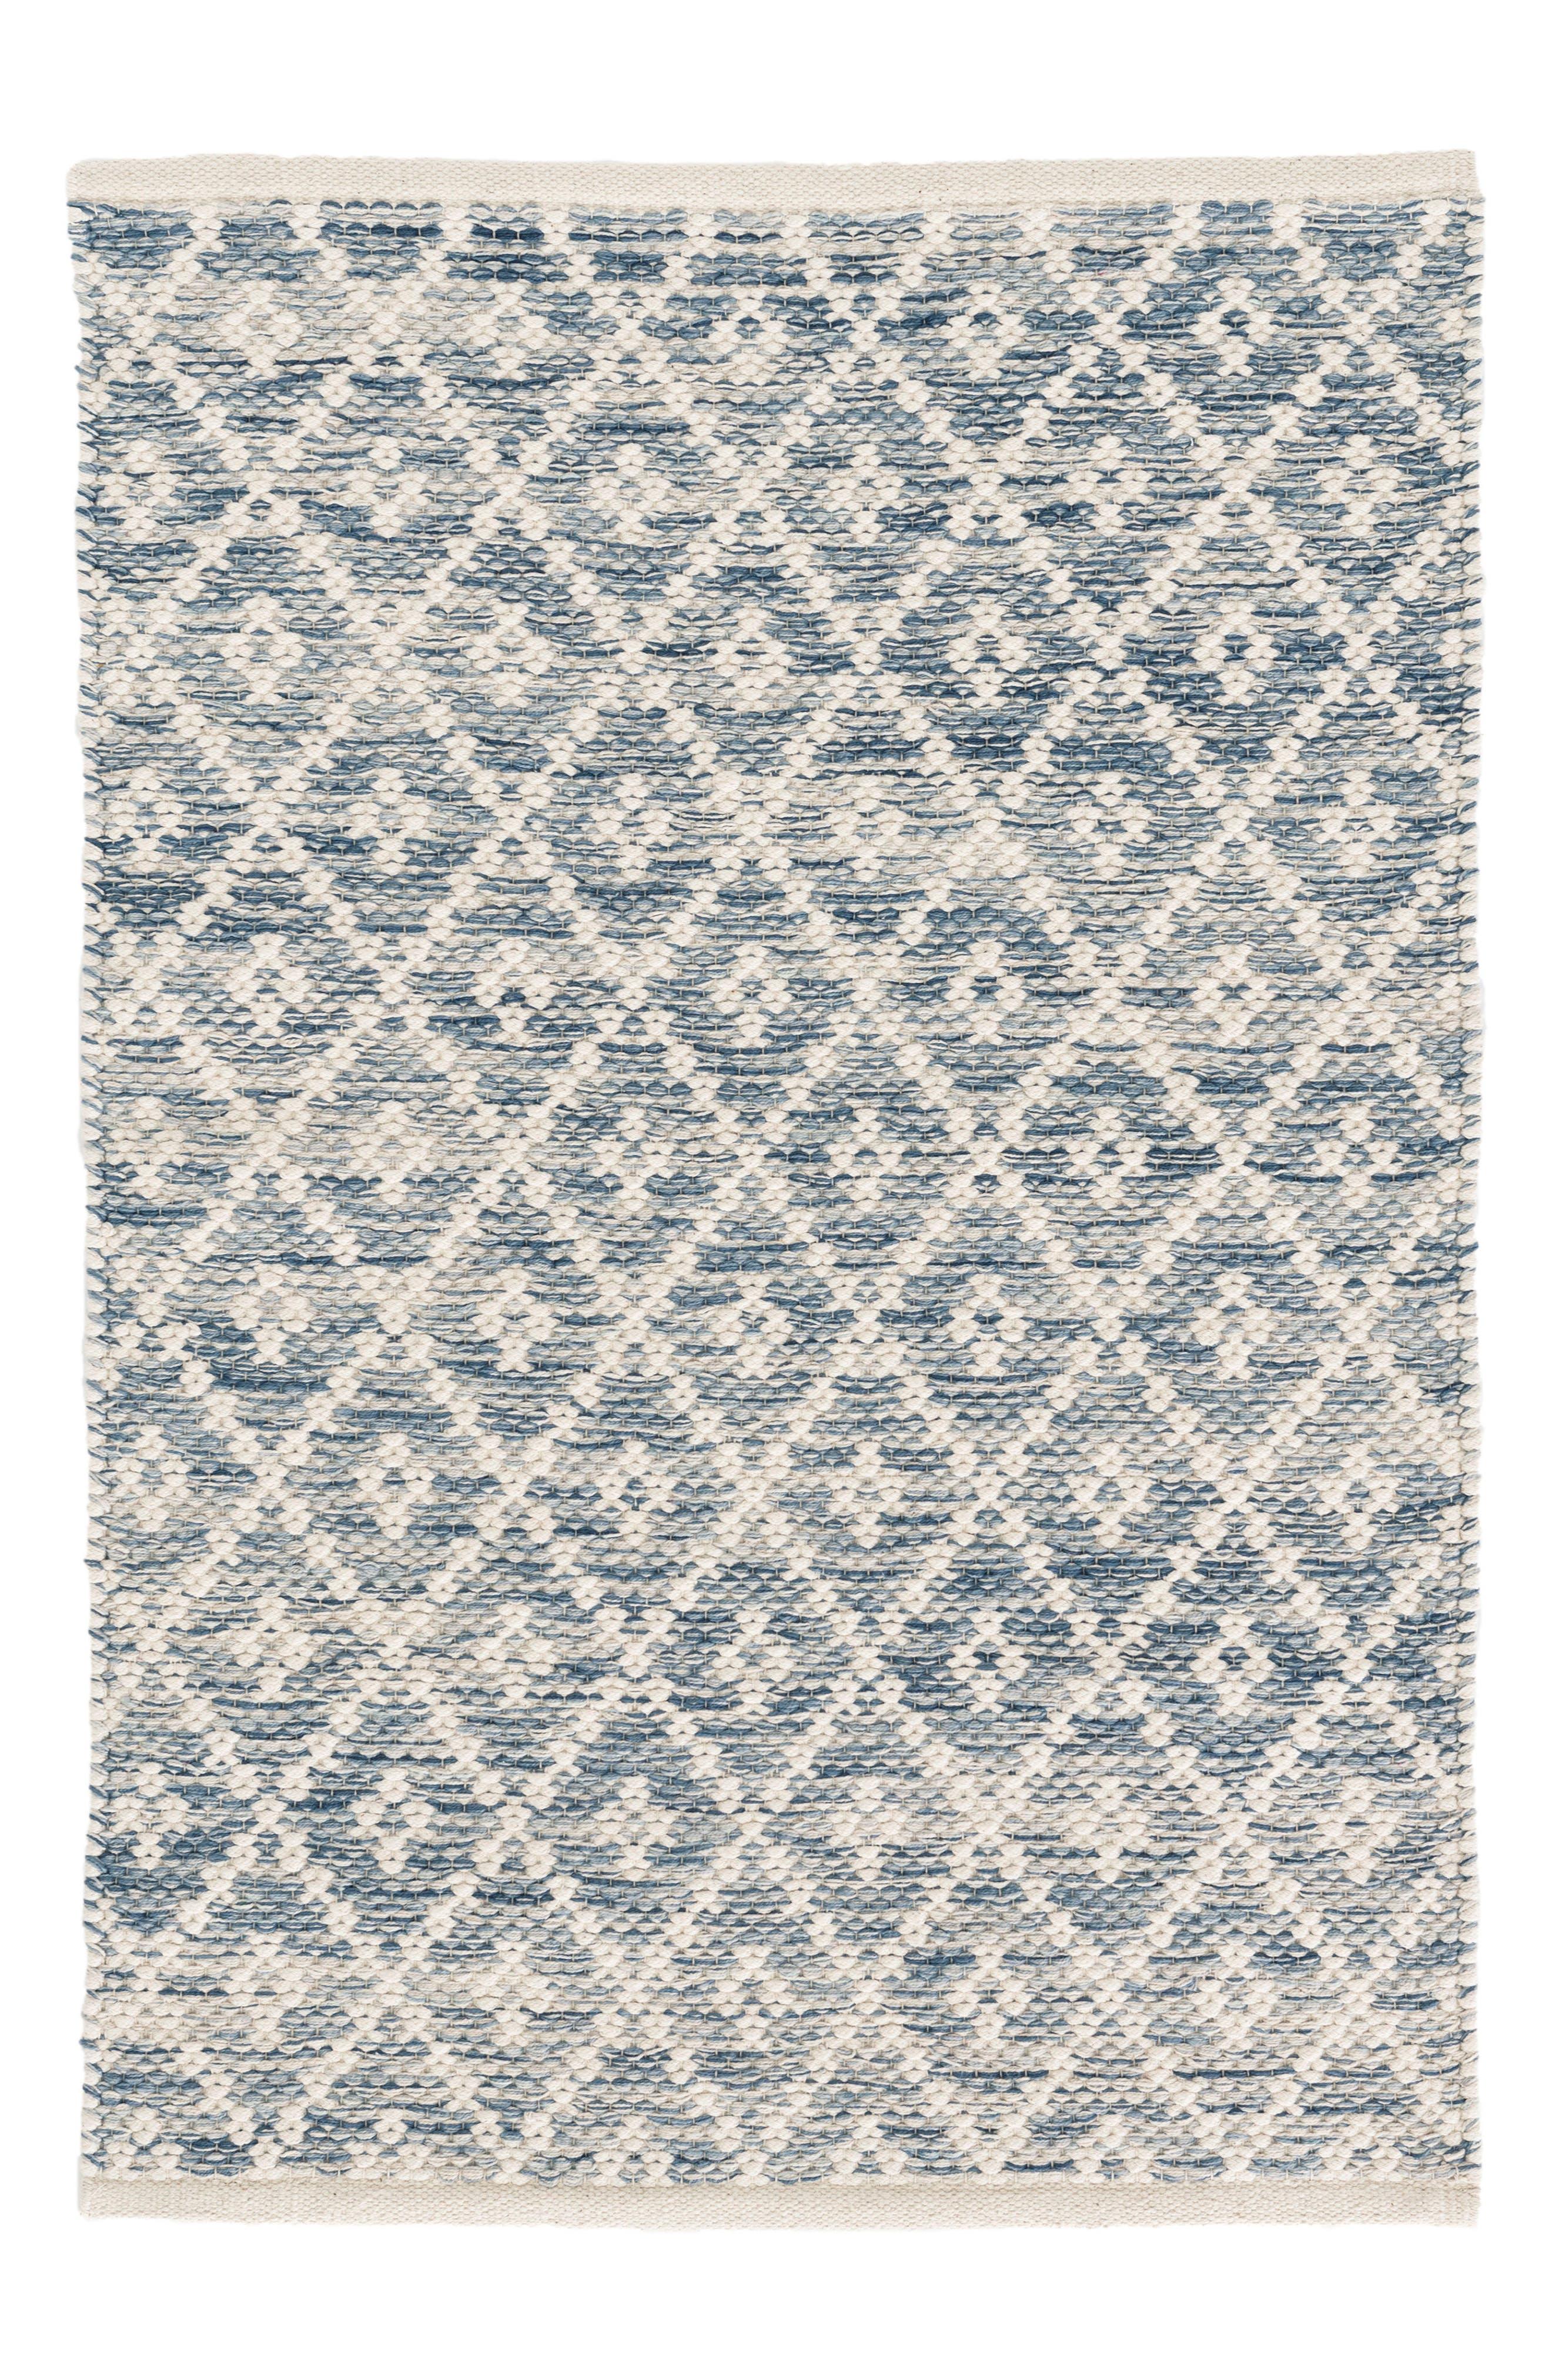 Melange Diamond Woven Rug,                         Main,                         color, BLUE